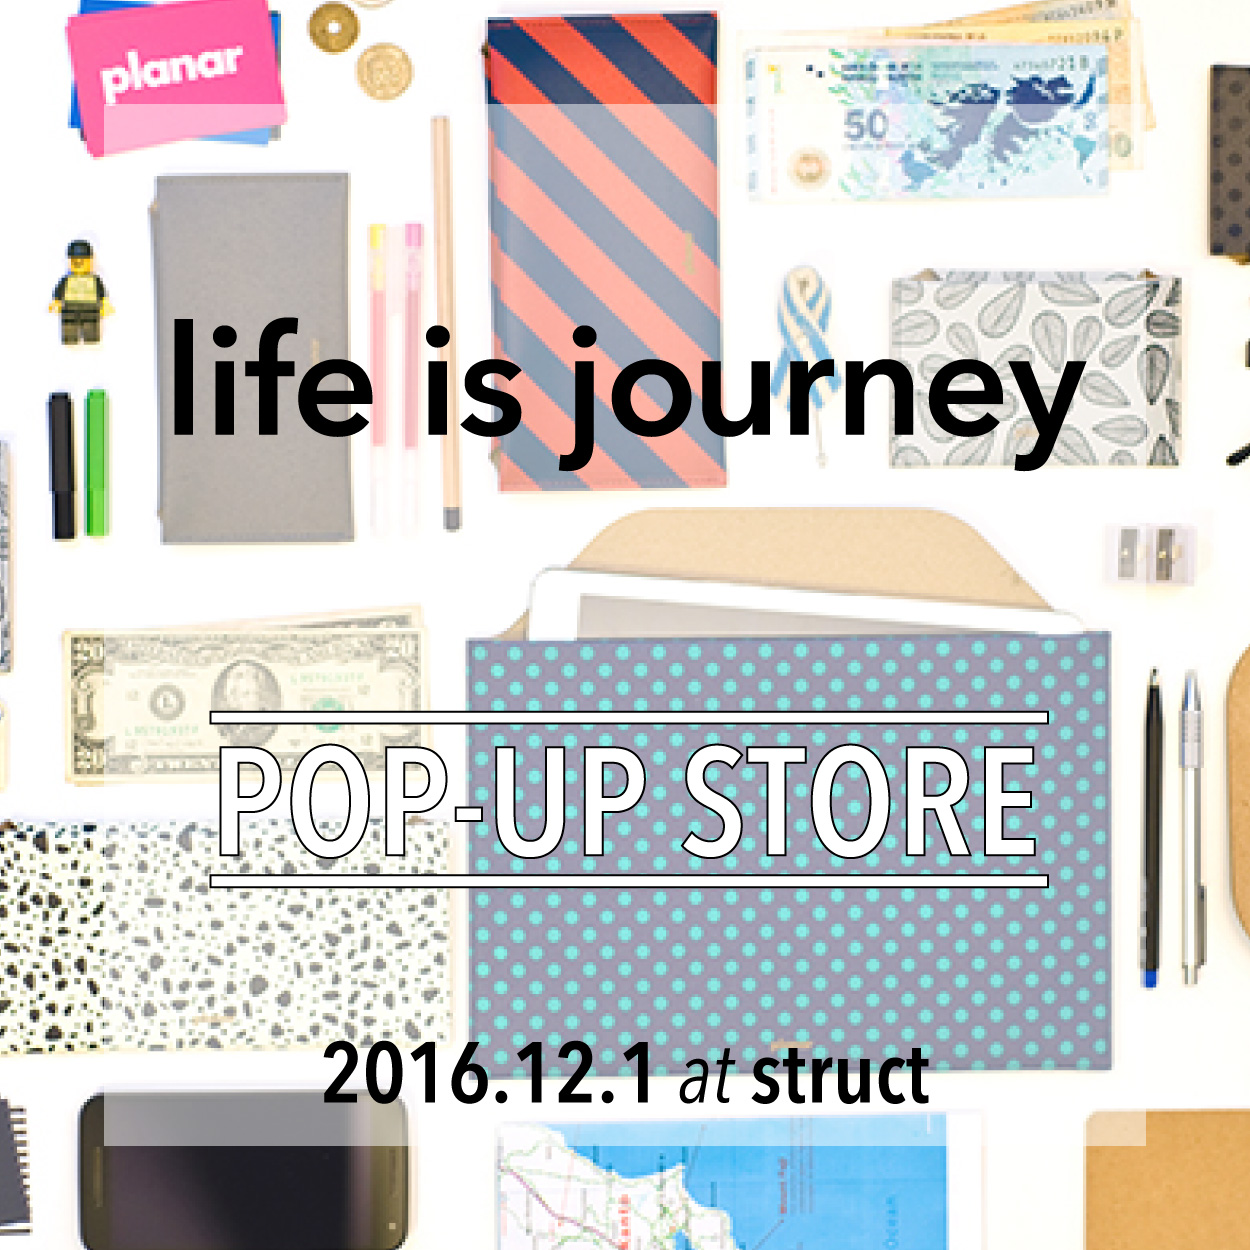 life_is_journey-01